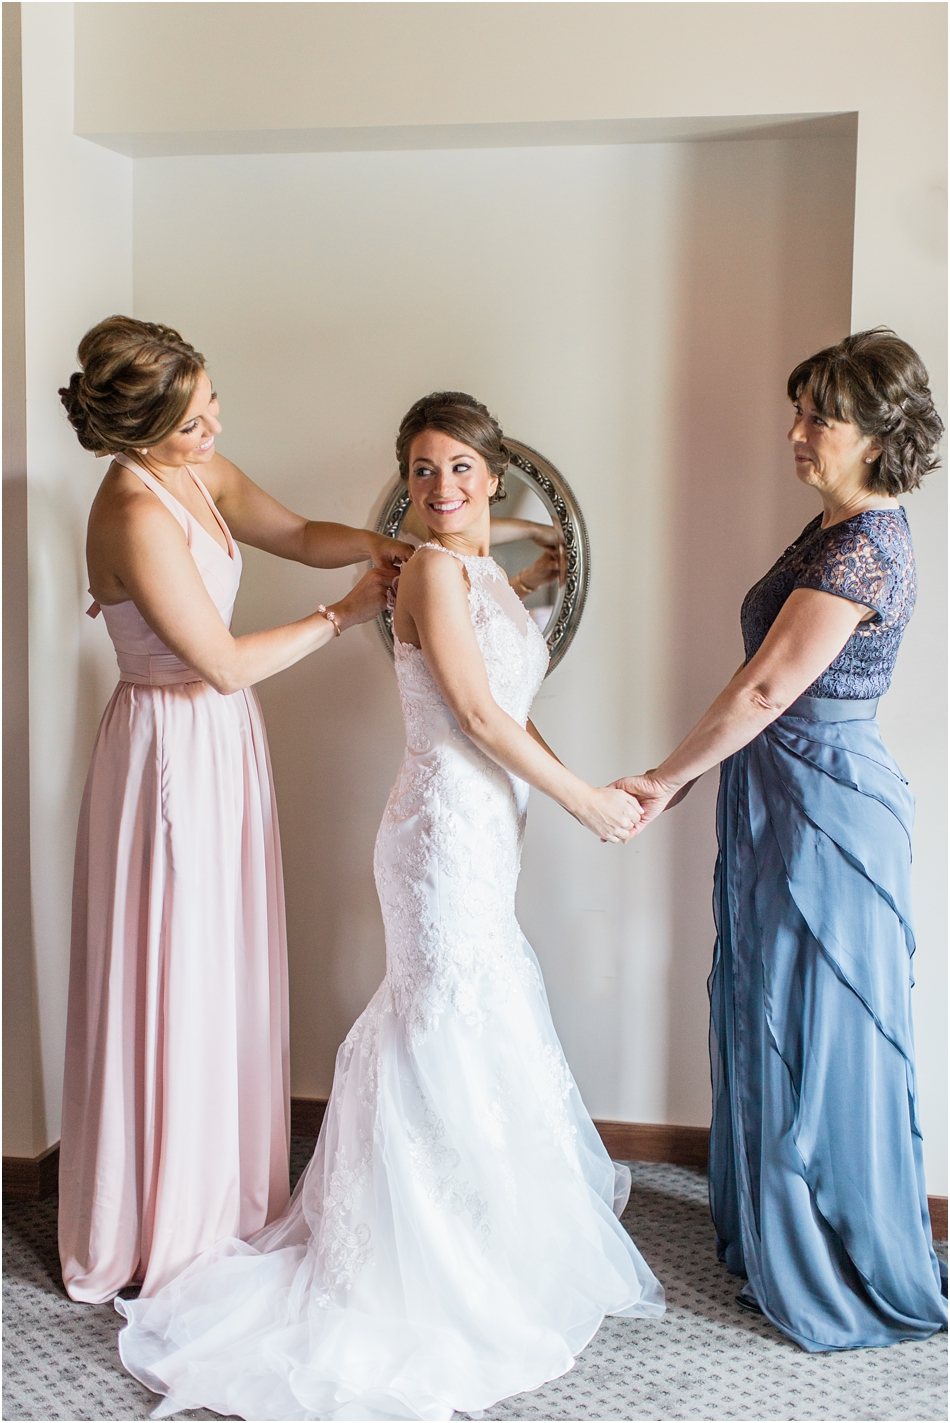 pine_hills_mirbeau_golf_club_boston_massachusetts_cape_cod_new_england_wedding_photographer_Meredith_Jane_Photography_photo_1682.jpg